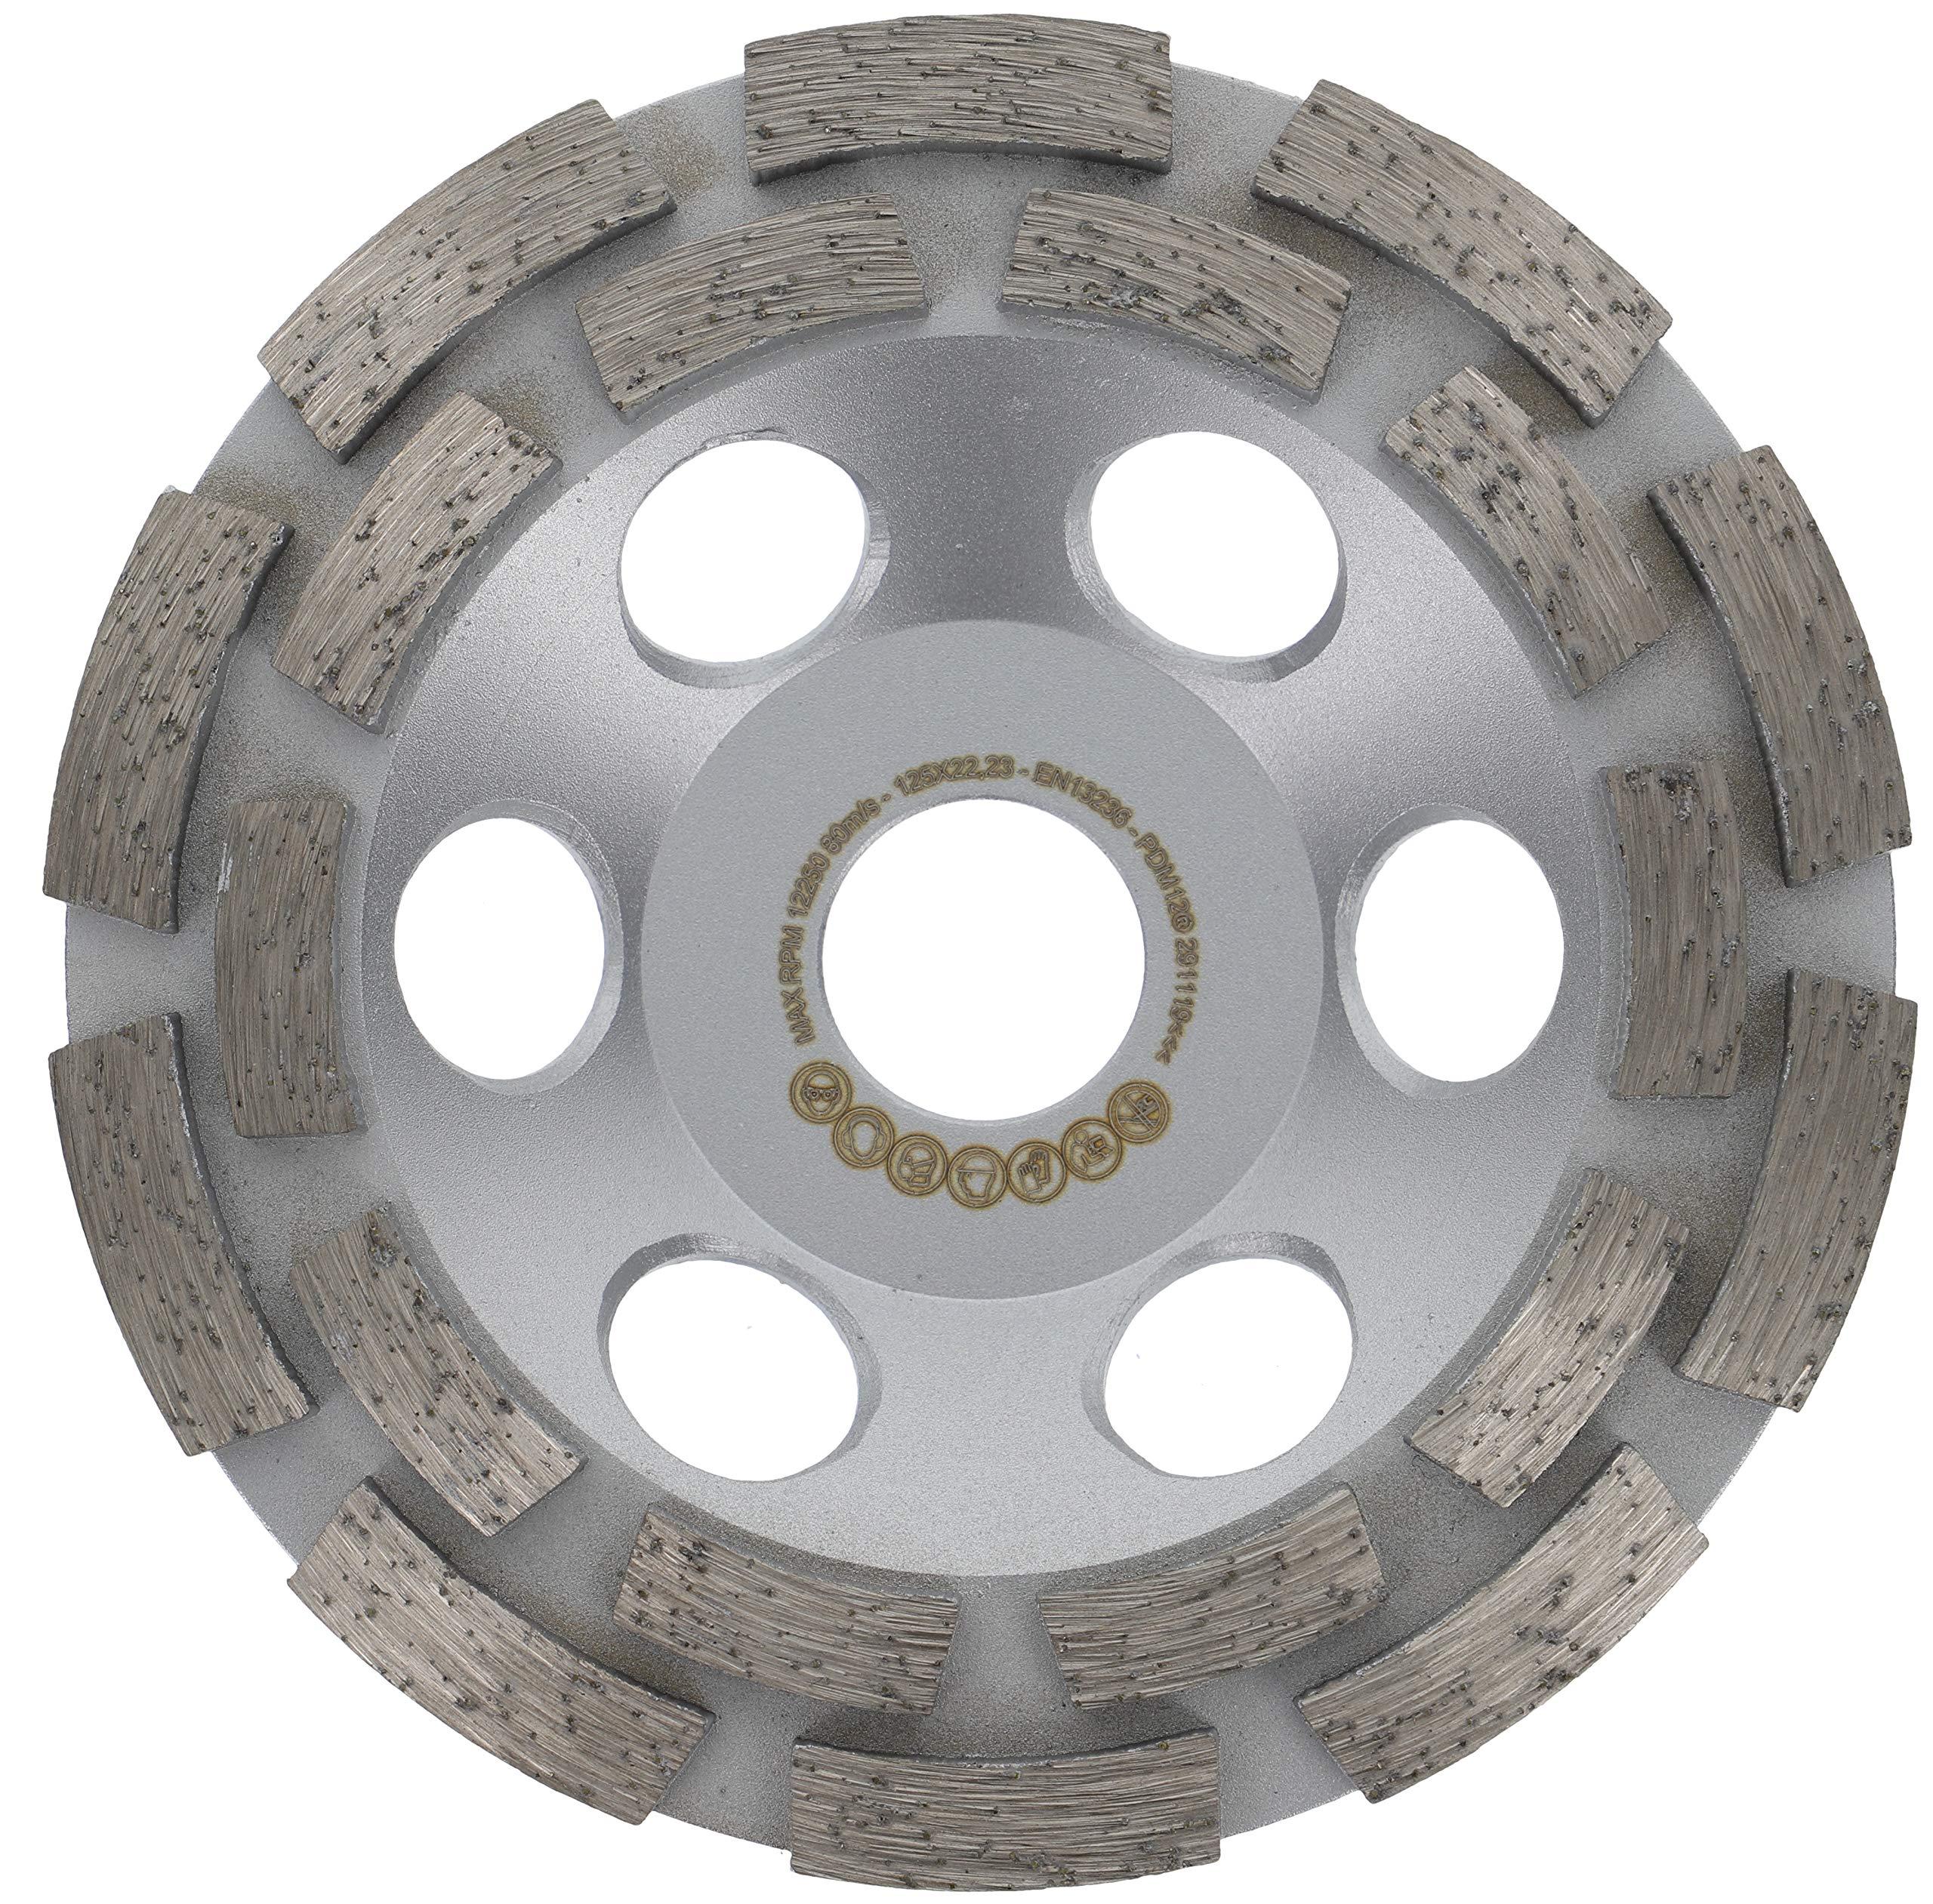 PRODIAMANT Profi Diamond Grinding Cup Wheel Concrete 125 mm 5 x 22.2 mm Diamond Grinding Head PDX82.918 125mm Concrete//Natural Stone Suitable Angle Grinder